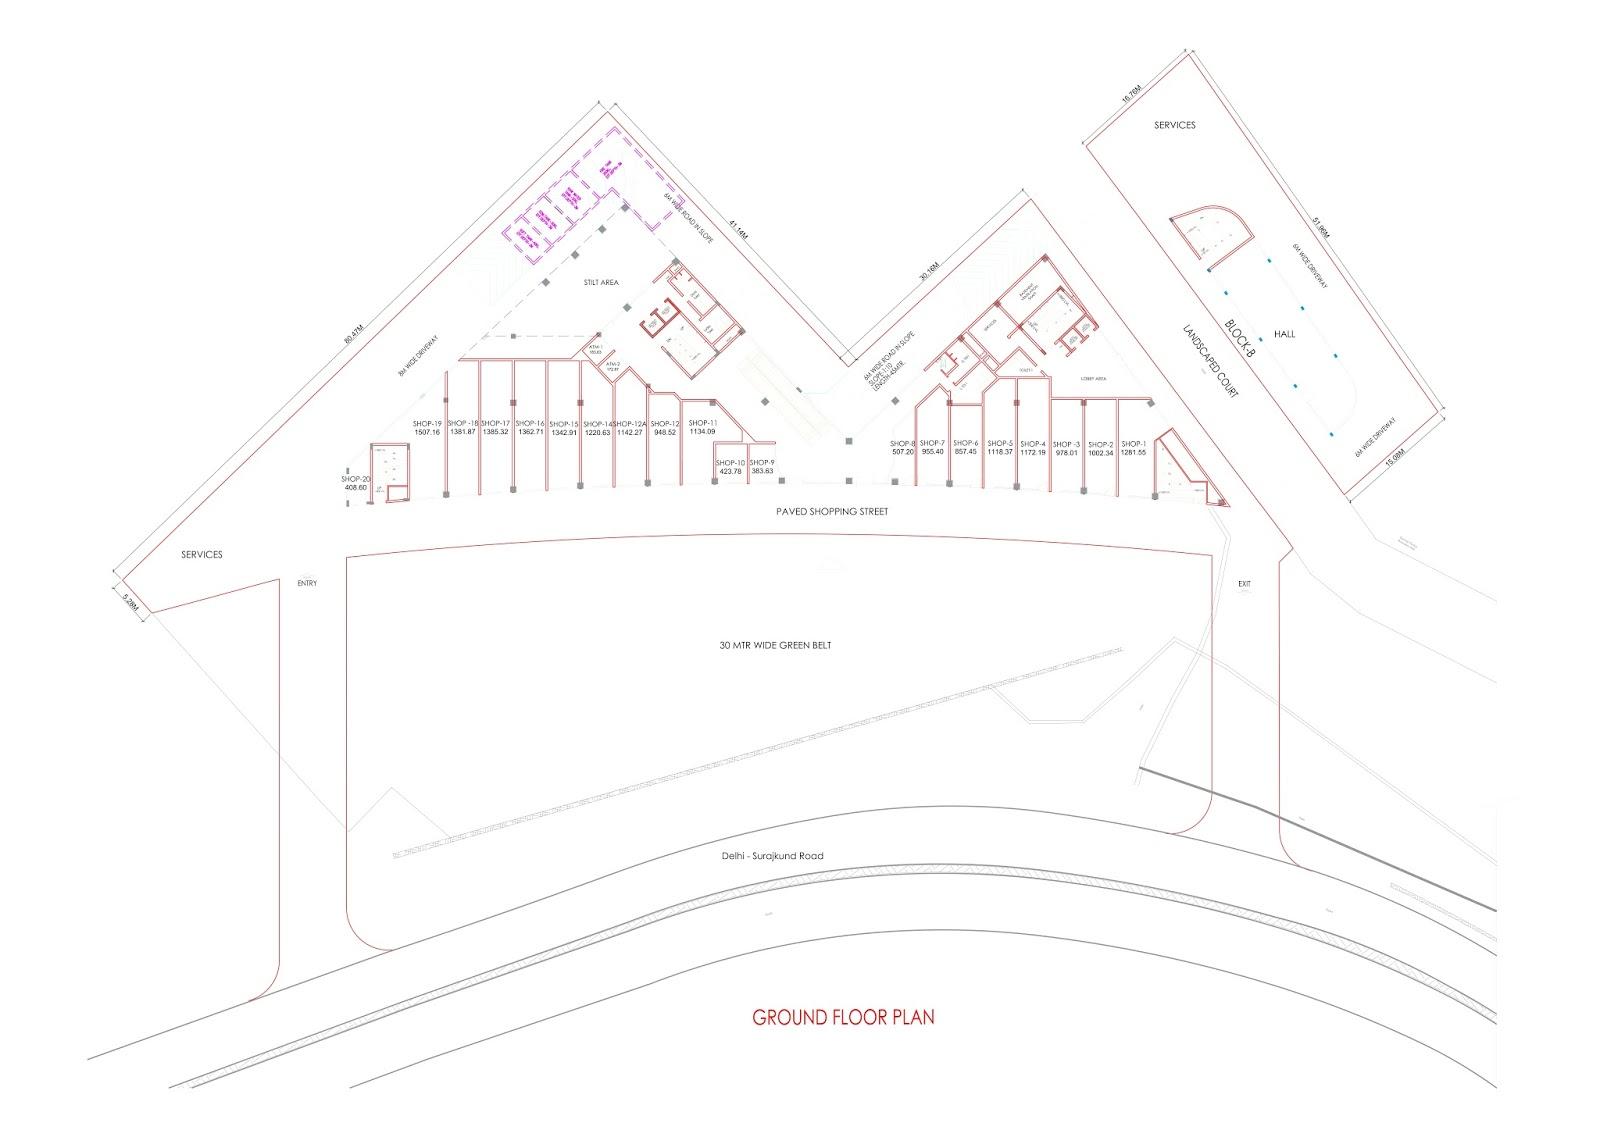 Ground Floor Plan - Commerce Business District